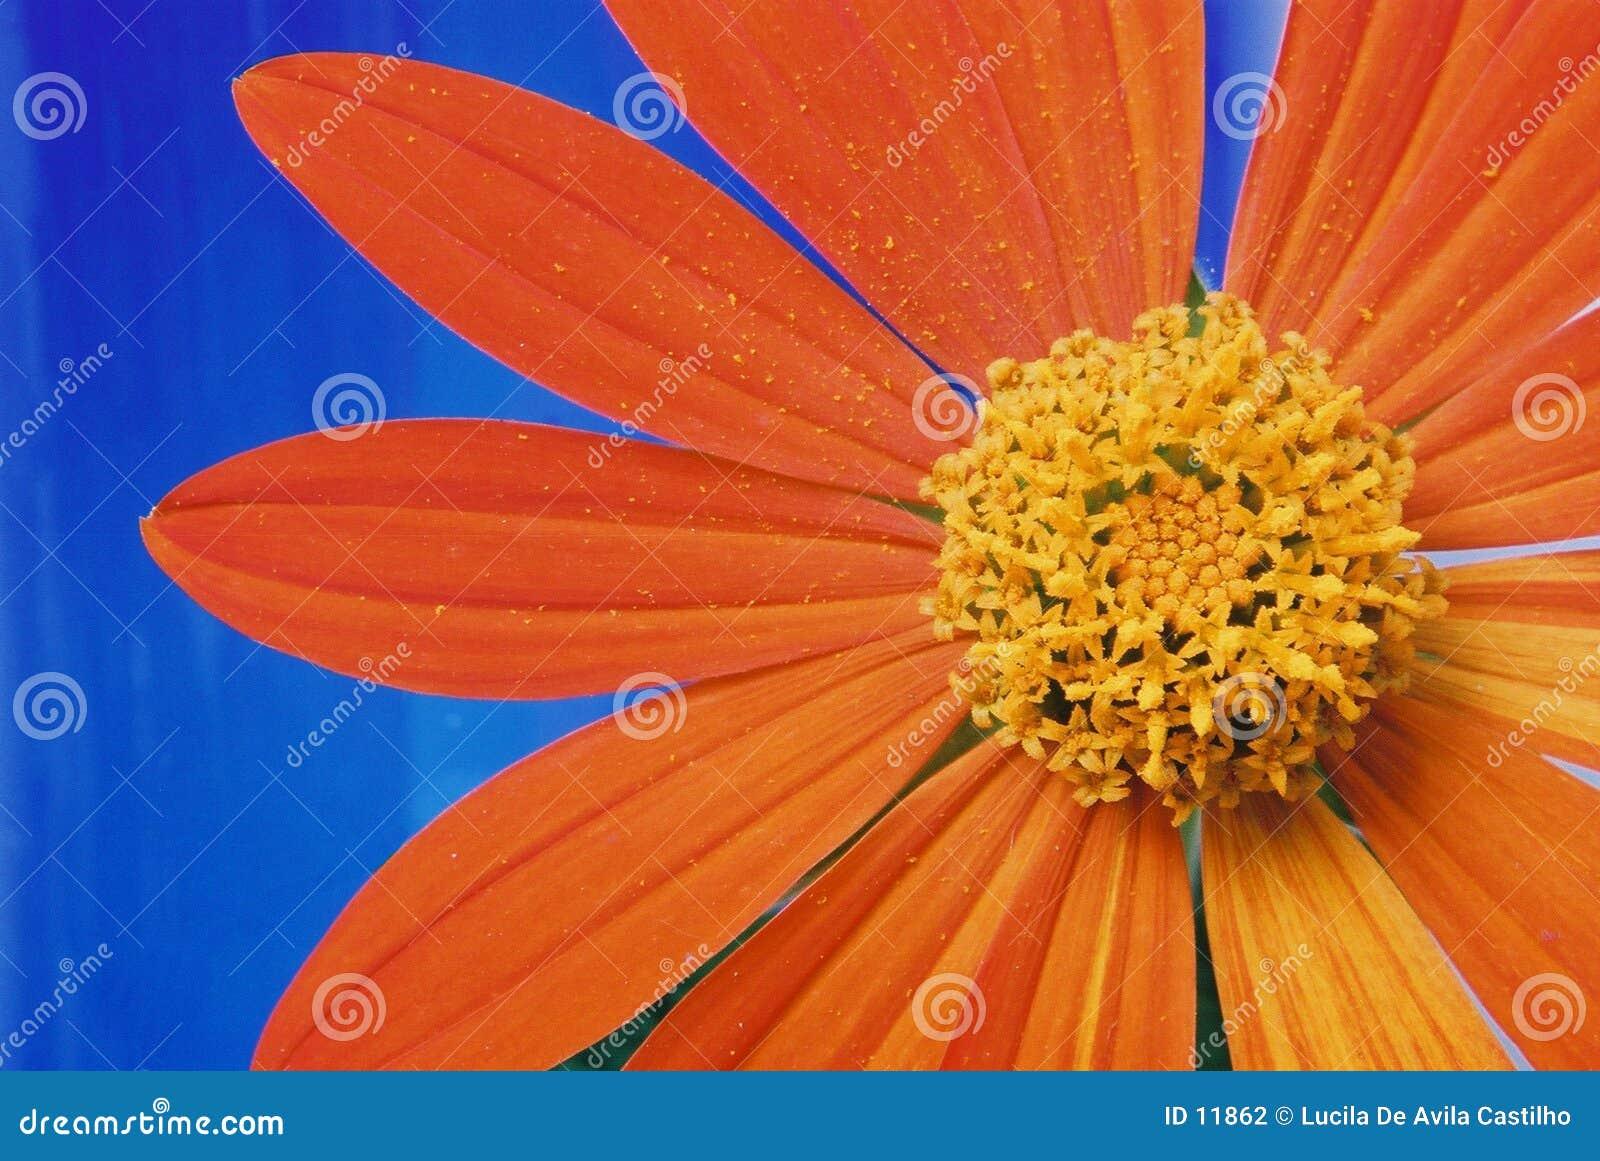 Flower and Orange Petals